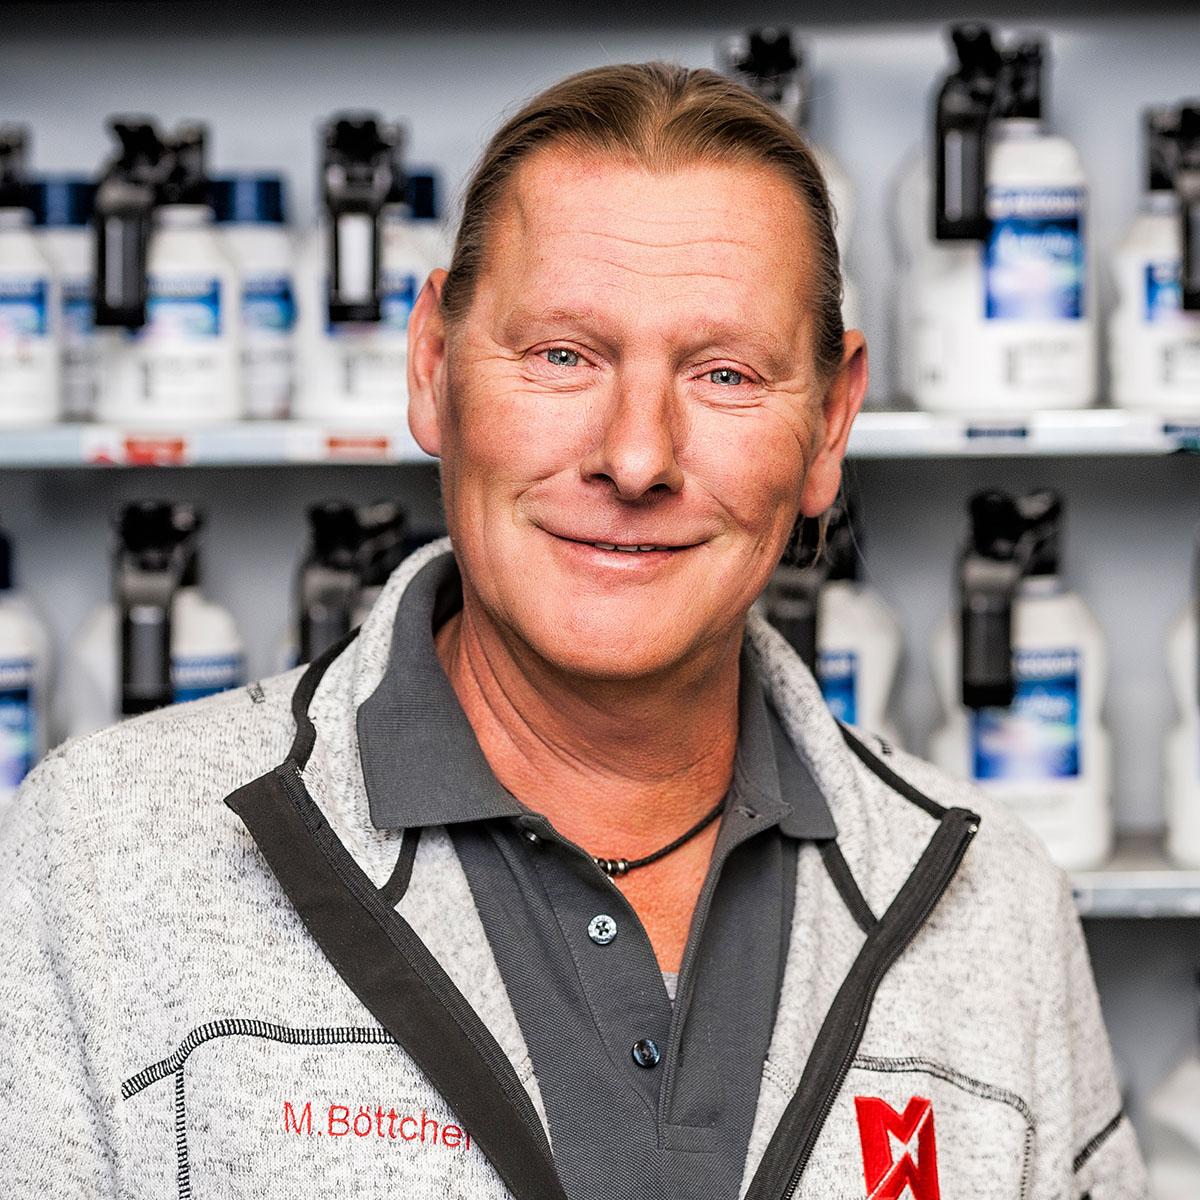 Michael Böttcher